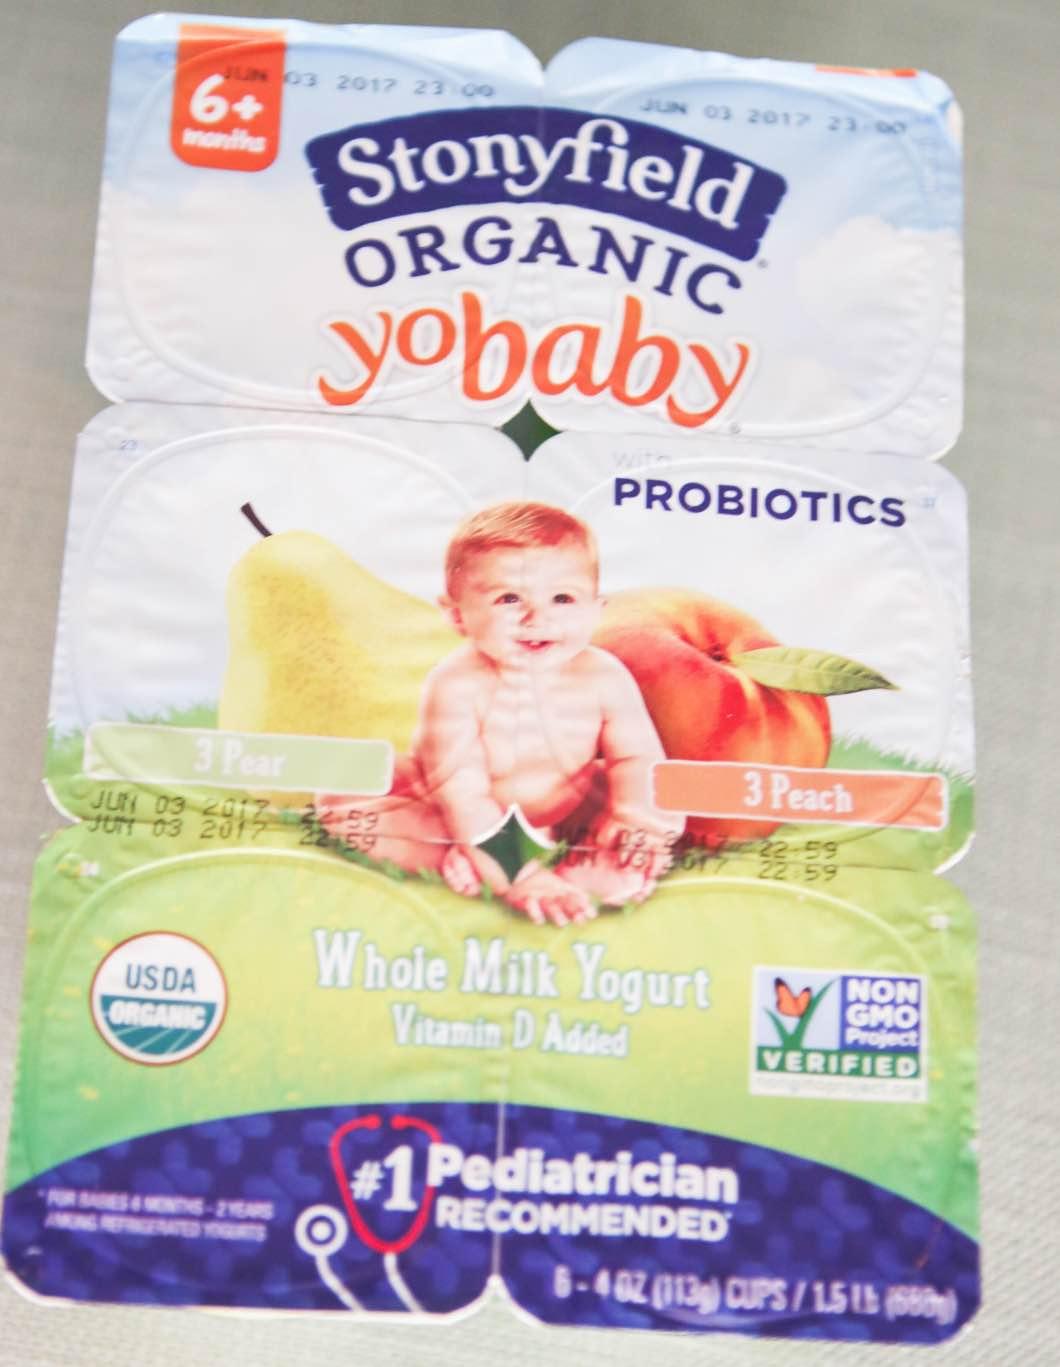 Stonyfield with Probiotics